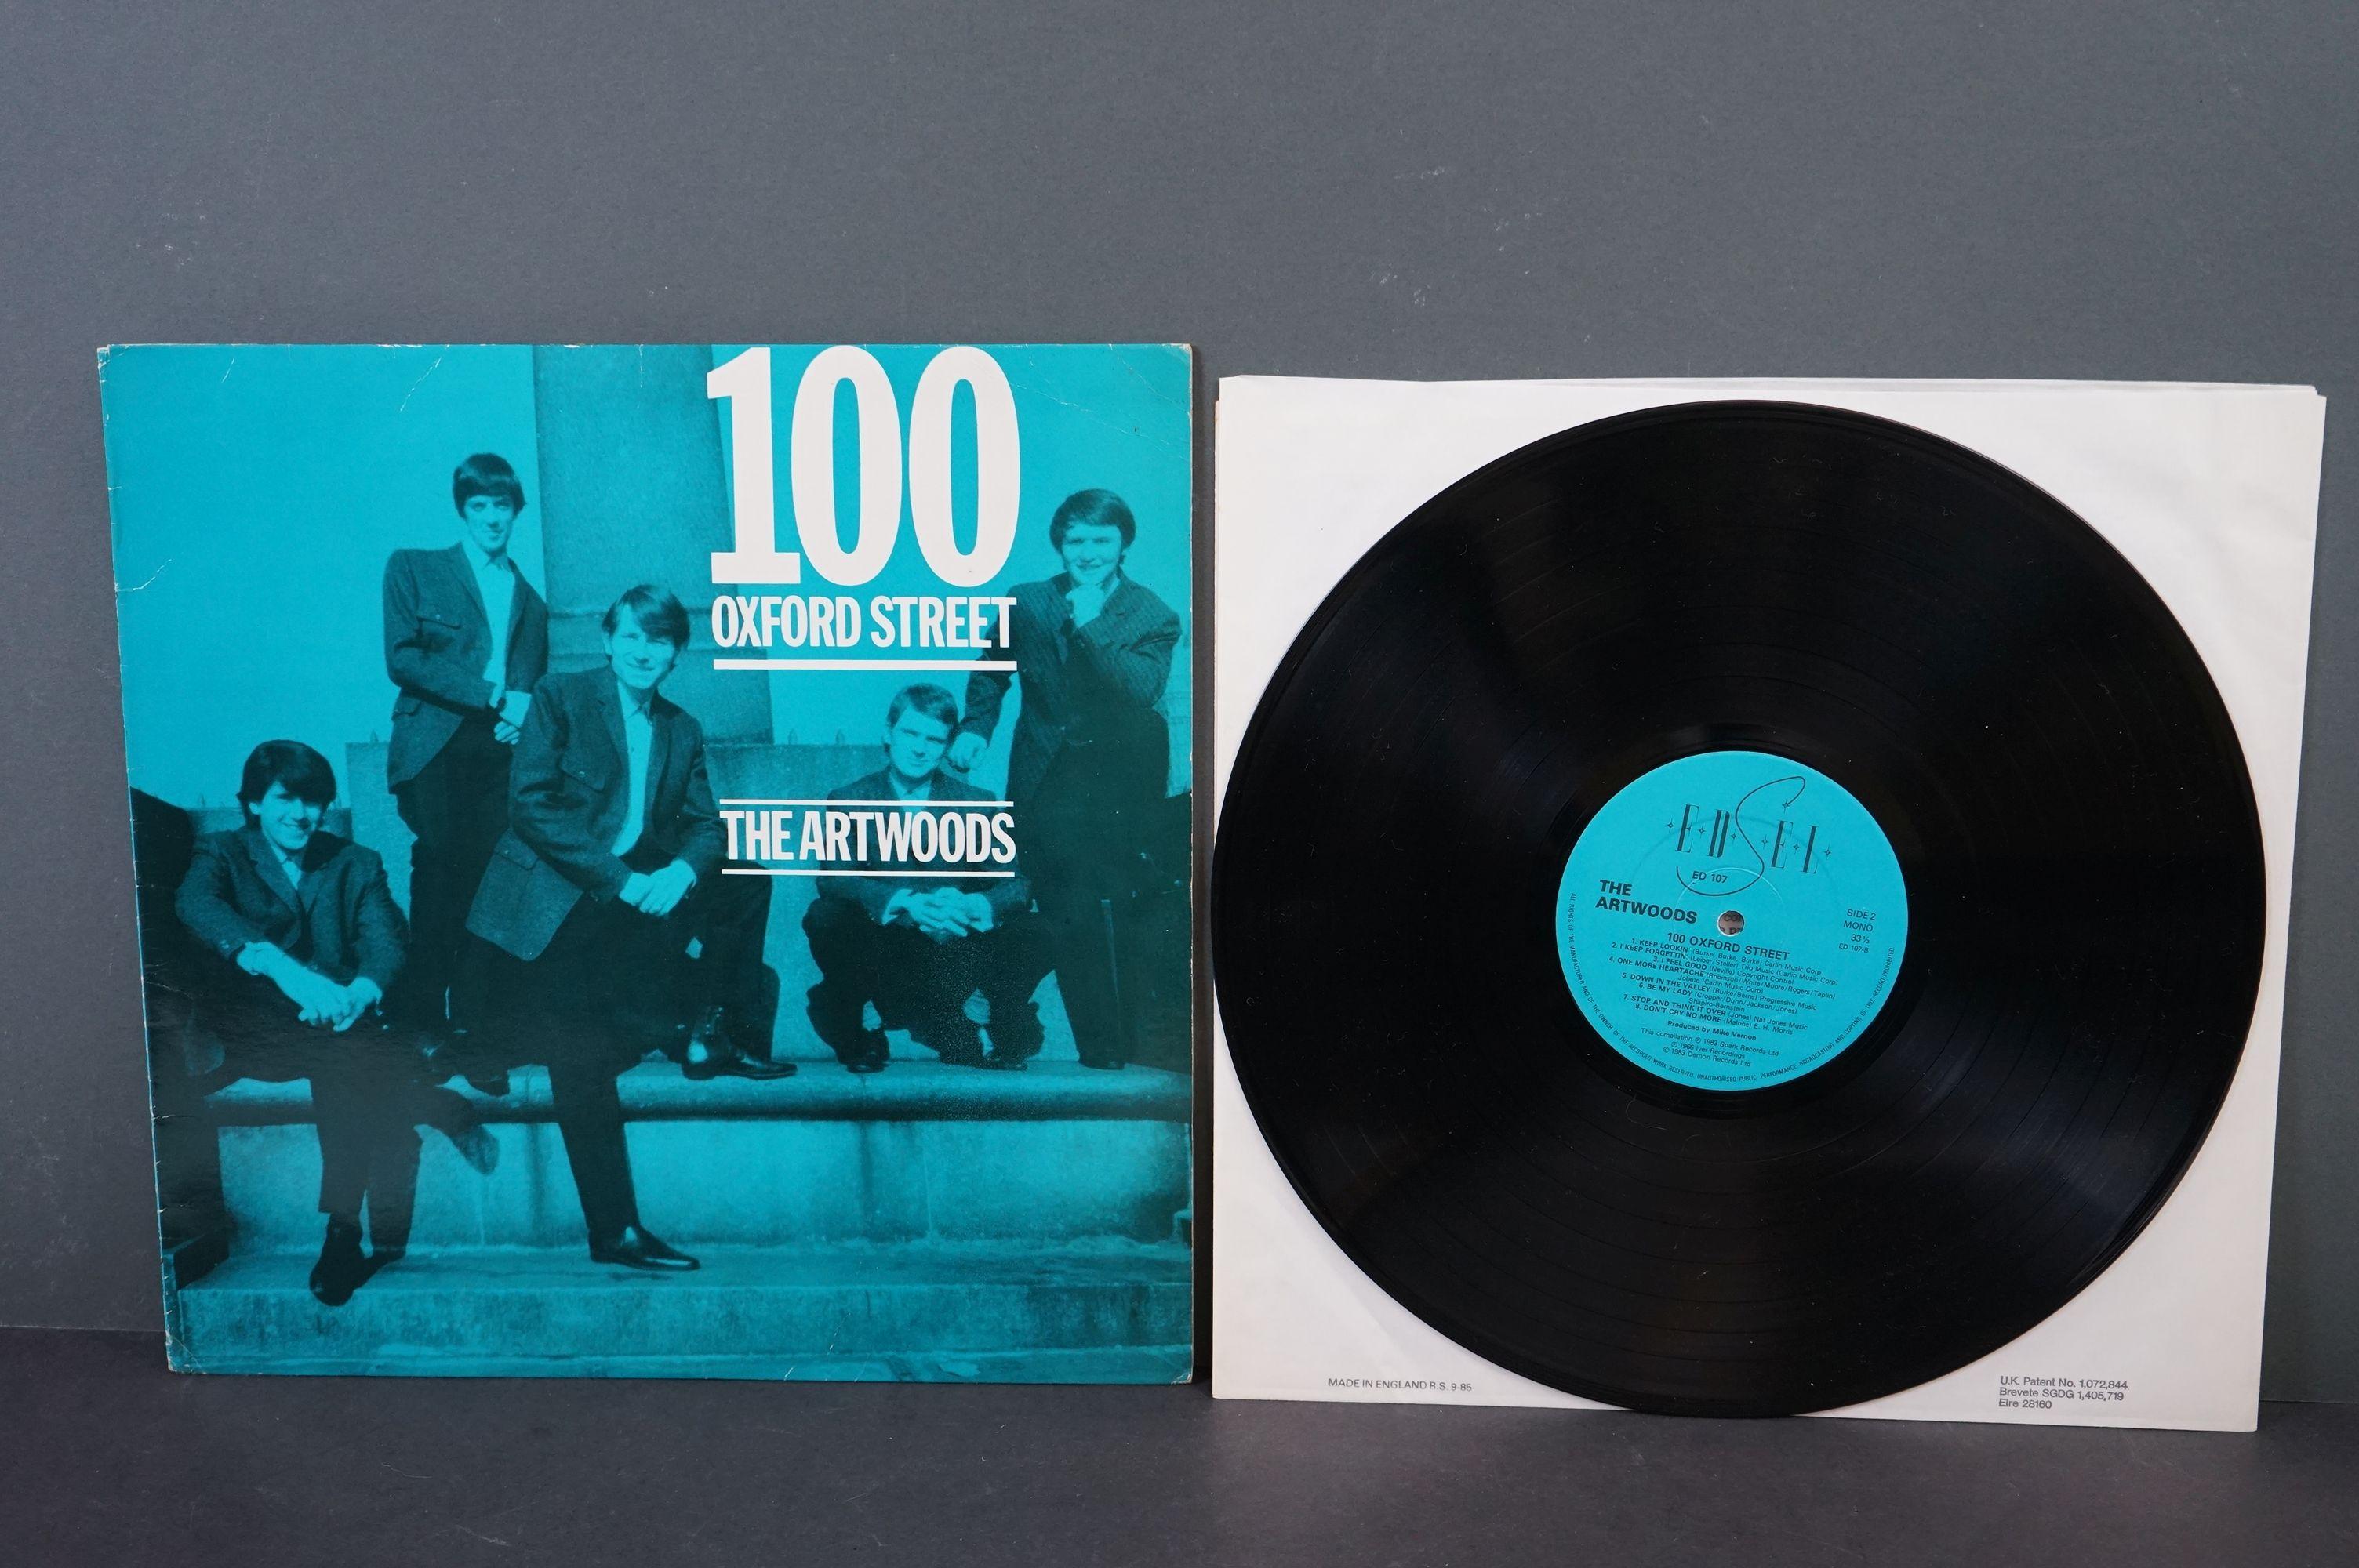 Vinyl - Psych / Prog - Five long deleted reissues of UK Psych / Prog Albums. Open Mind - Open - Image 8 of 12